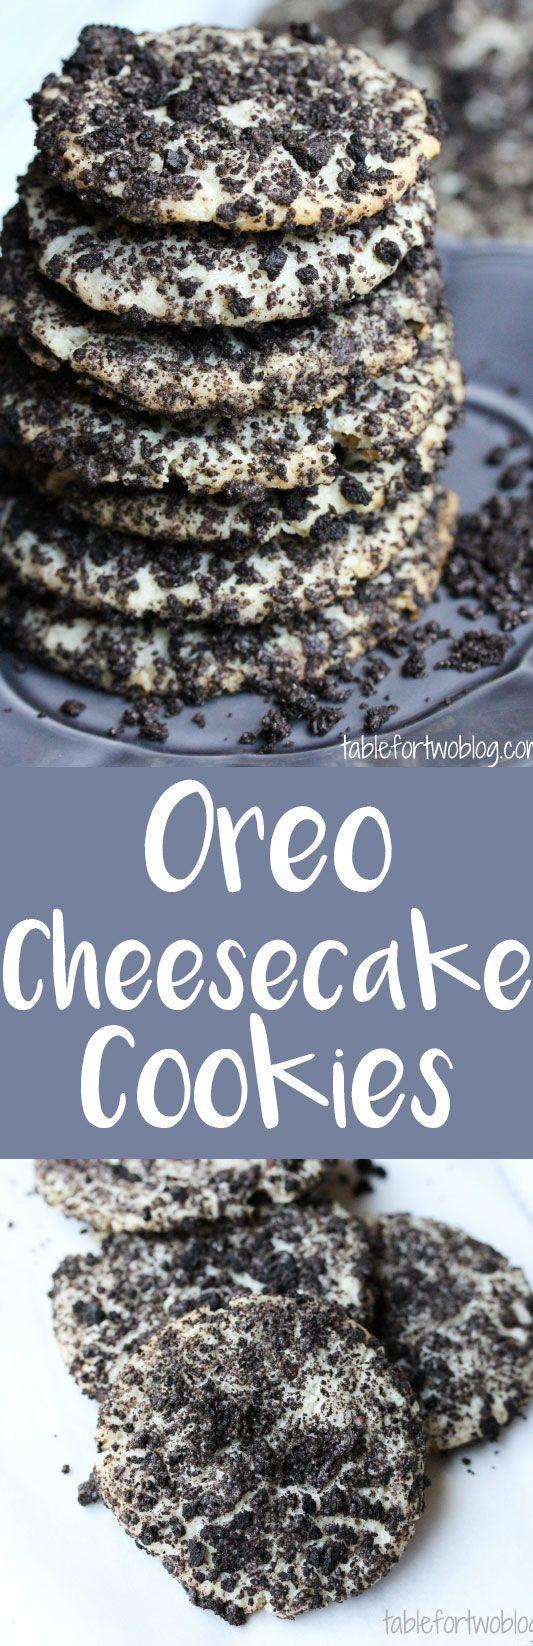 Oreo cheesecake cookies are so addicting! http://www.tablefortwoblog.com/oreo-cheesecake-cookies/